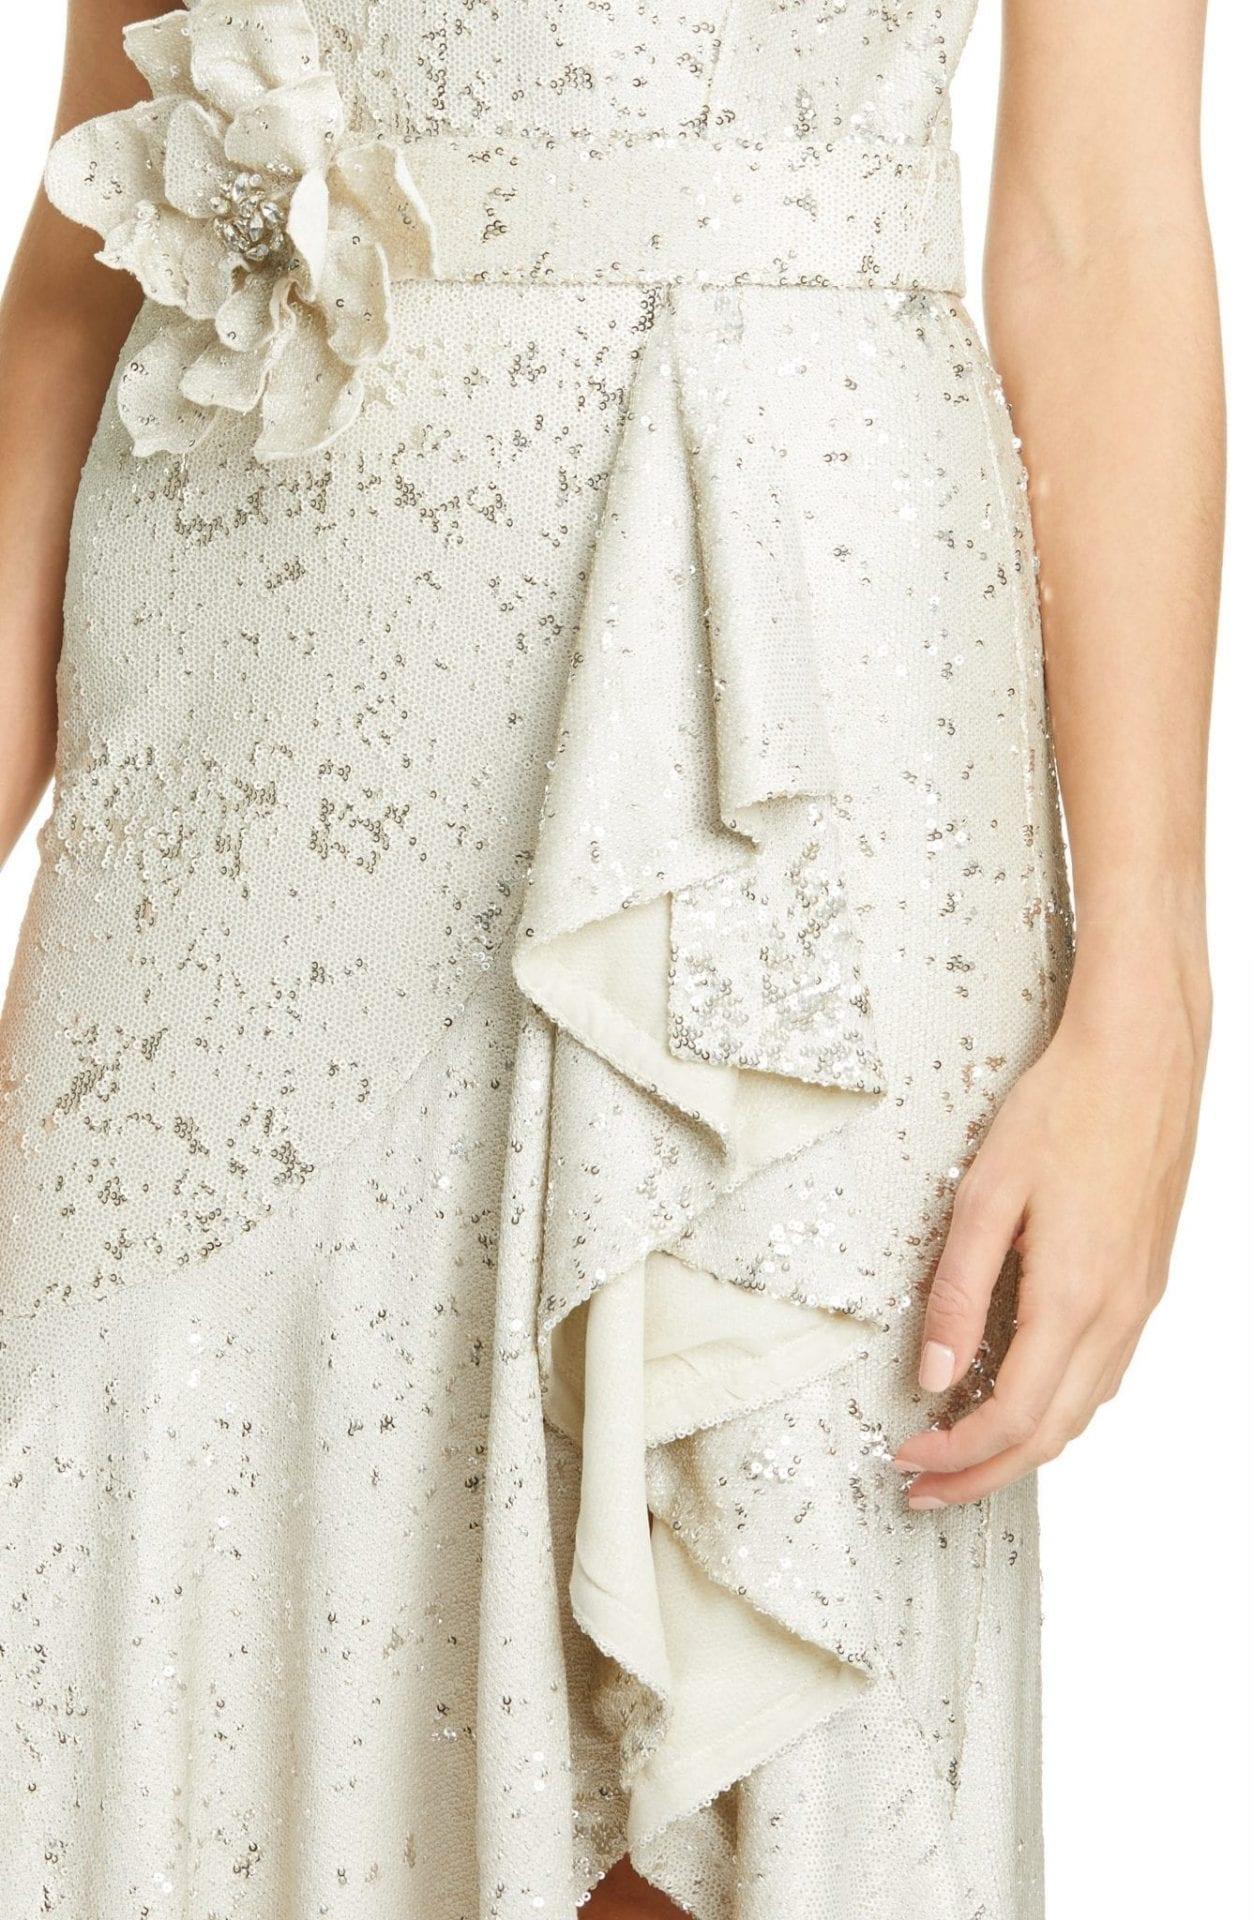 BADGLEY MISCHKA COLLECTION Badgley Mischka Sequin Ruffle Gown